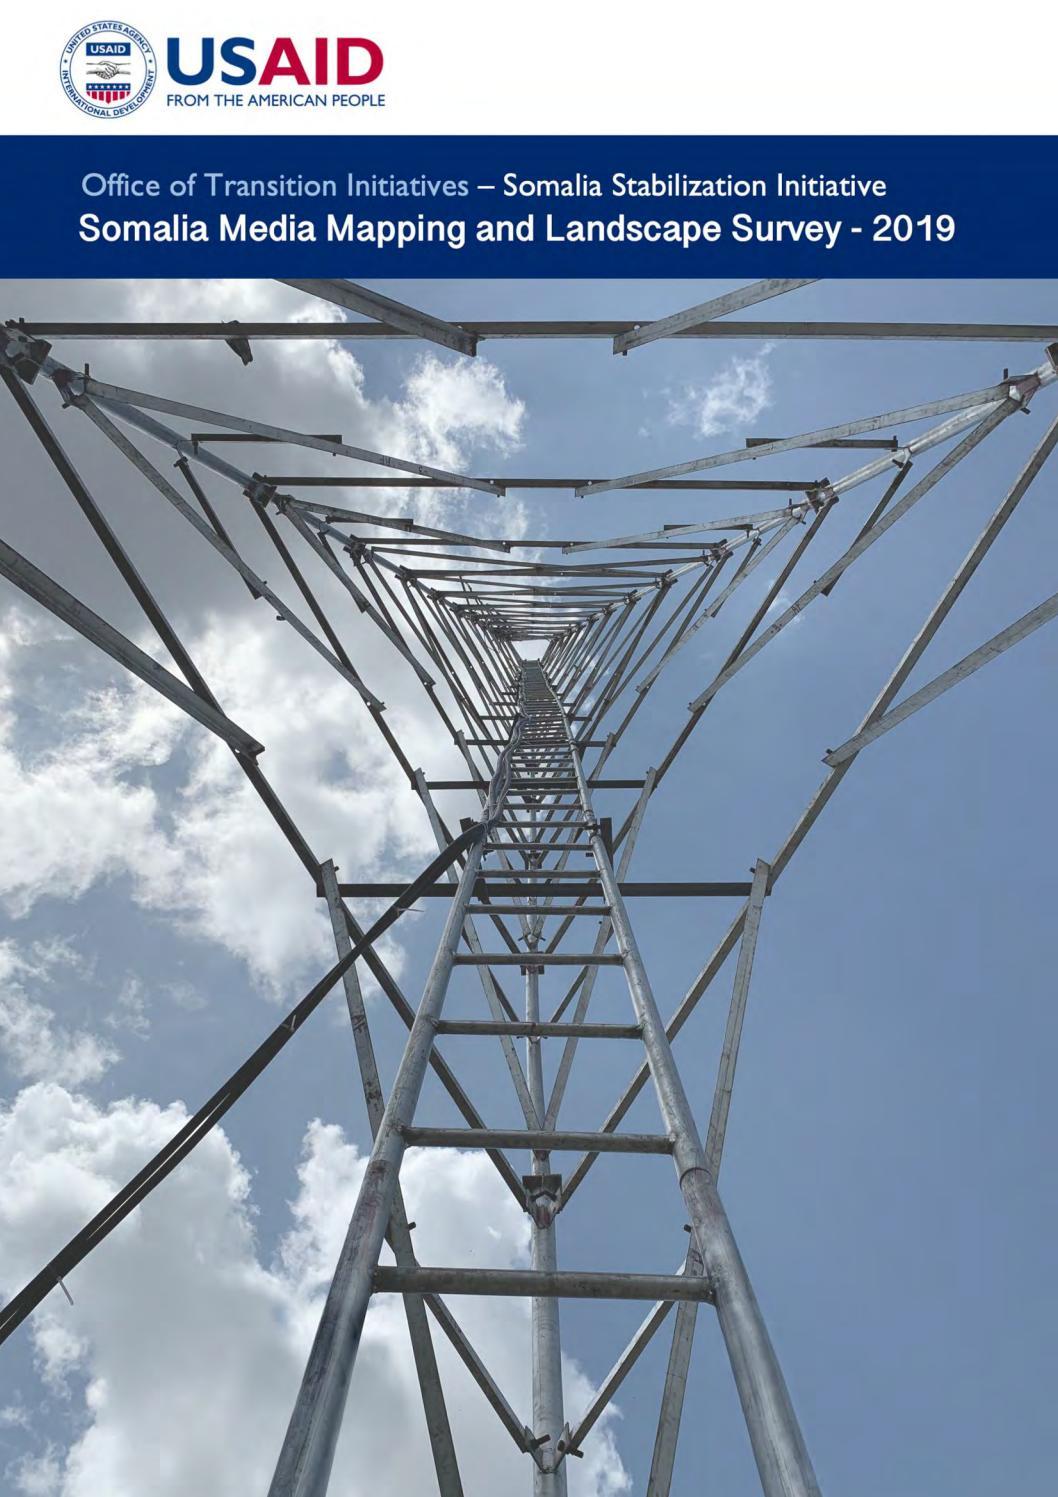 Somalia Media Mapping and Landscape Survey - 2019 by Steve